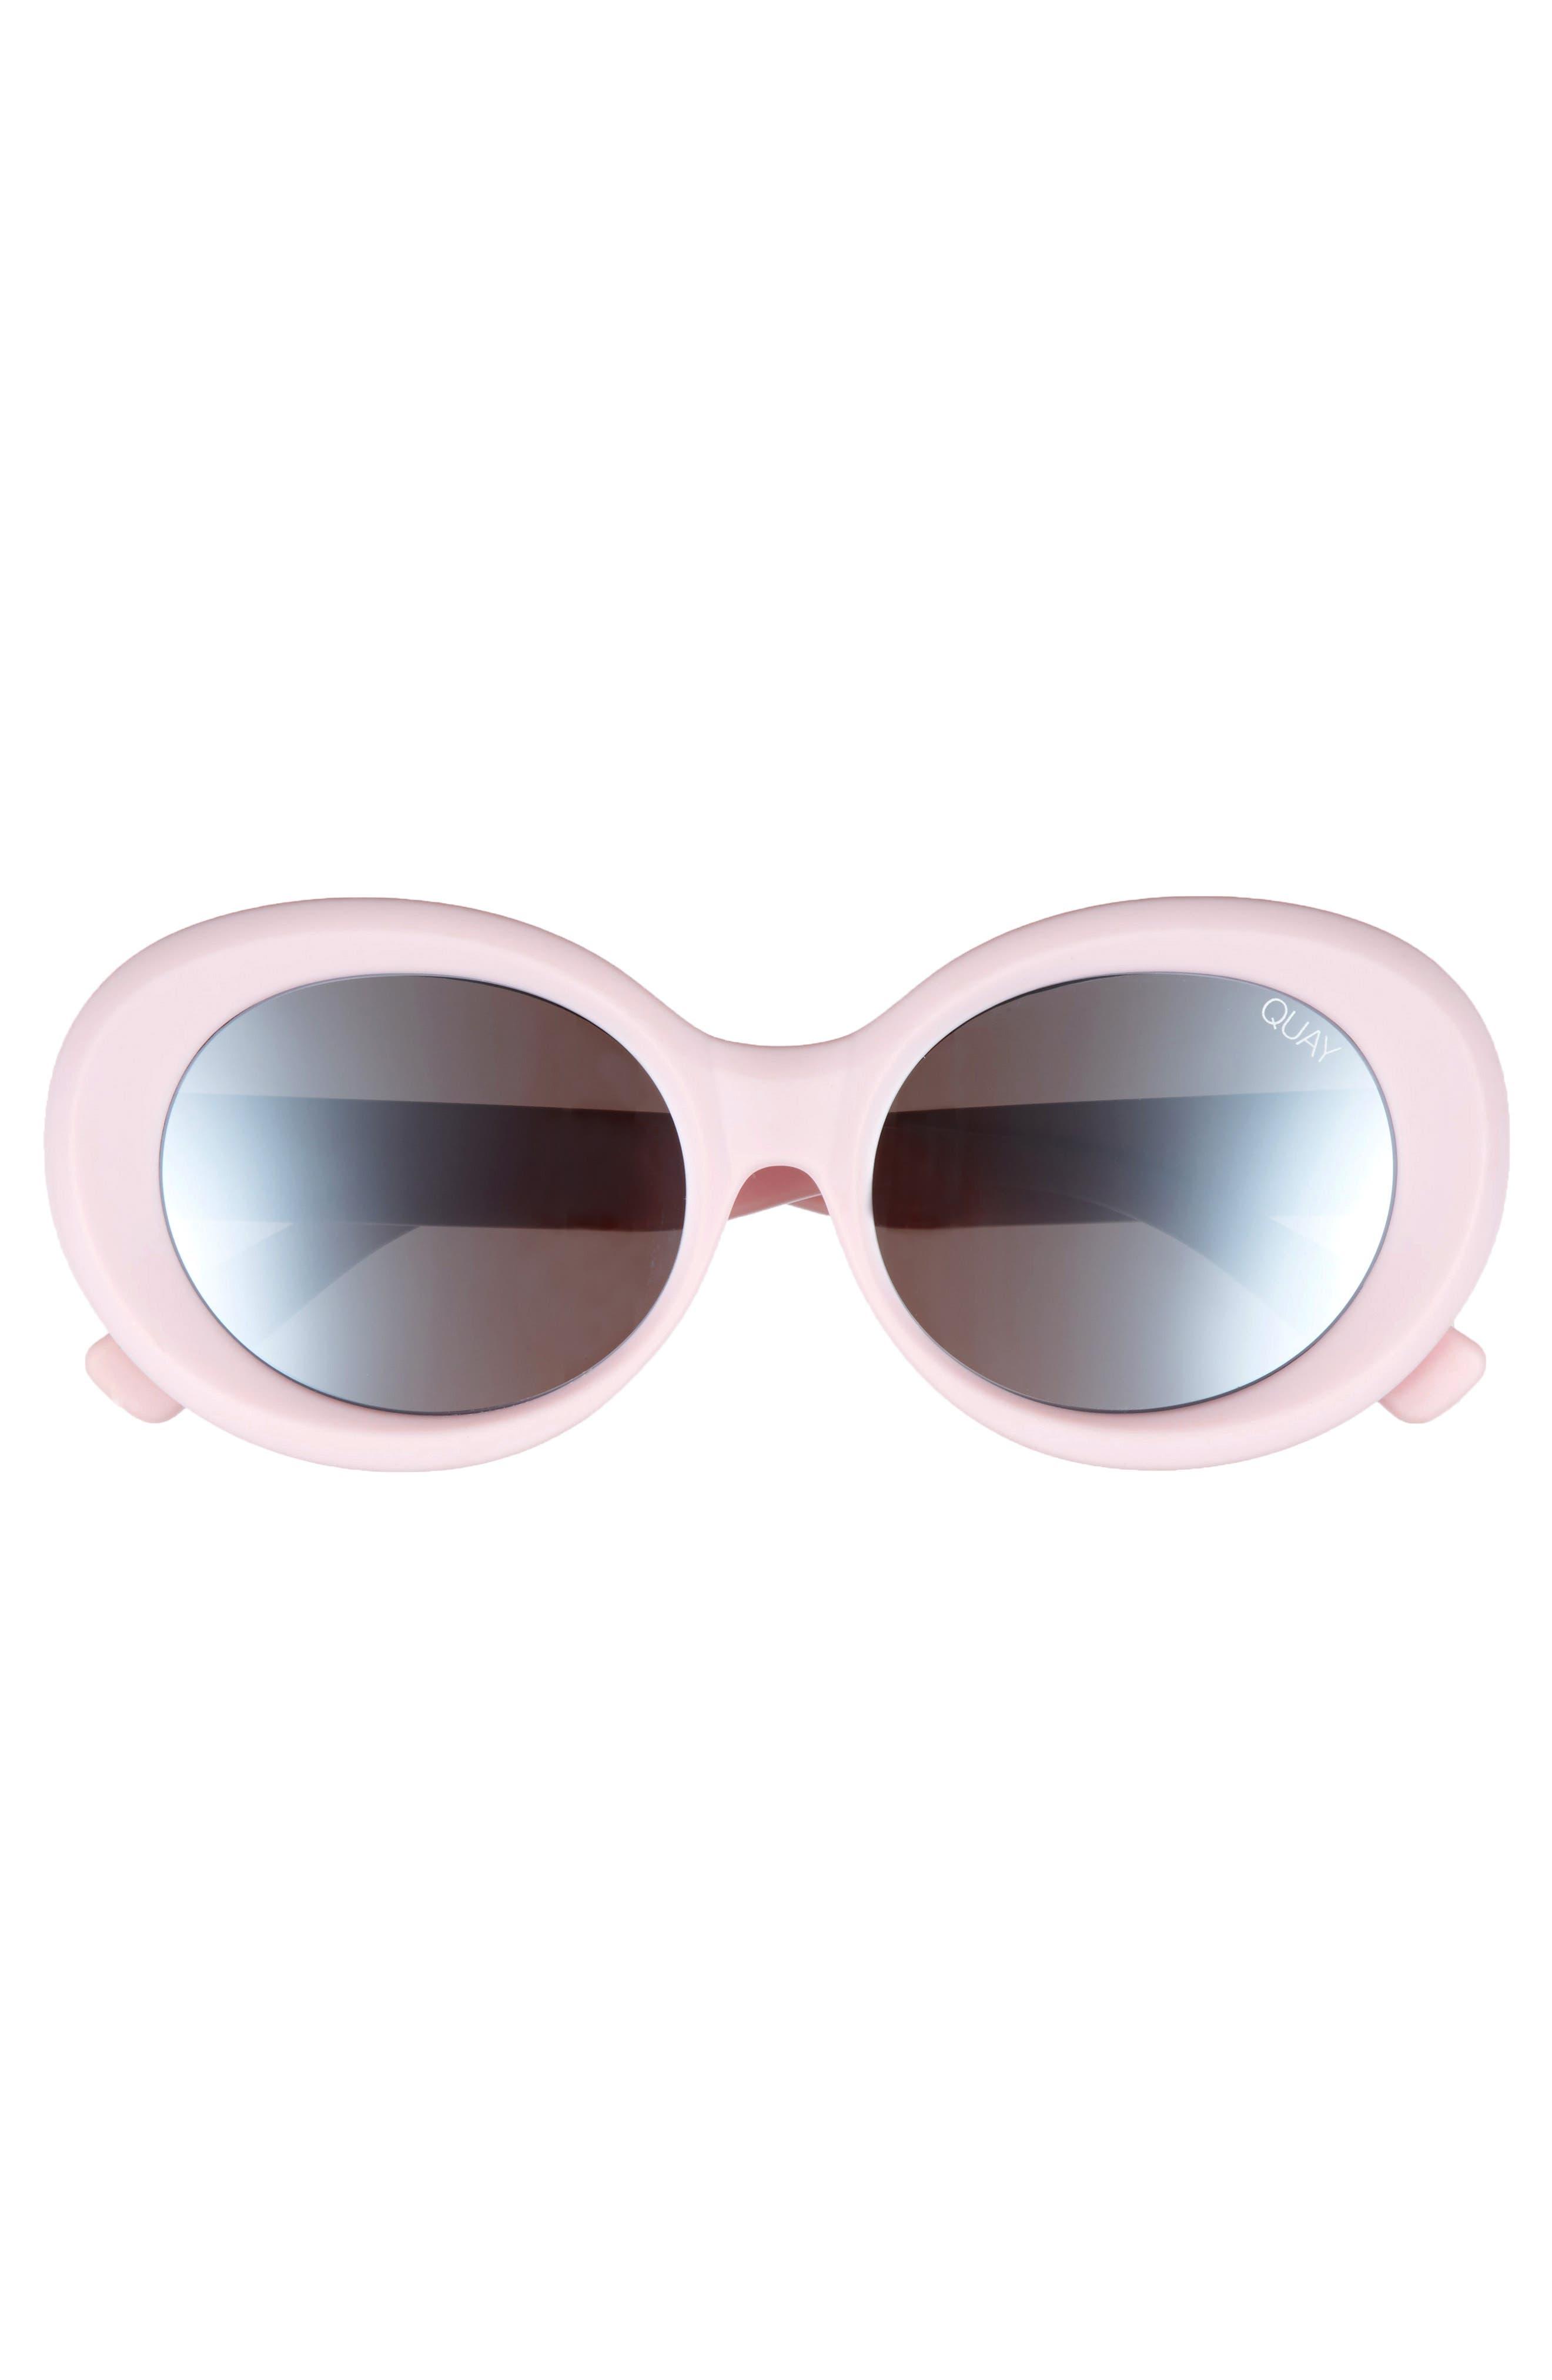 Mess Around 52mm Oval Sunglasses,                             Alternate thumbnail 3, color,                             Lilac/ Smoke